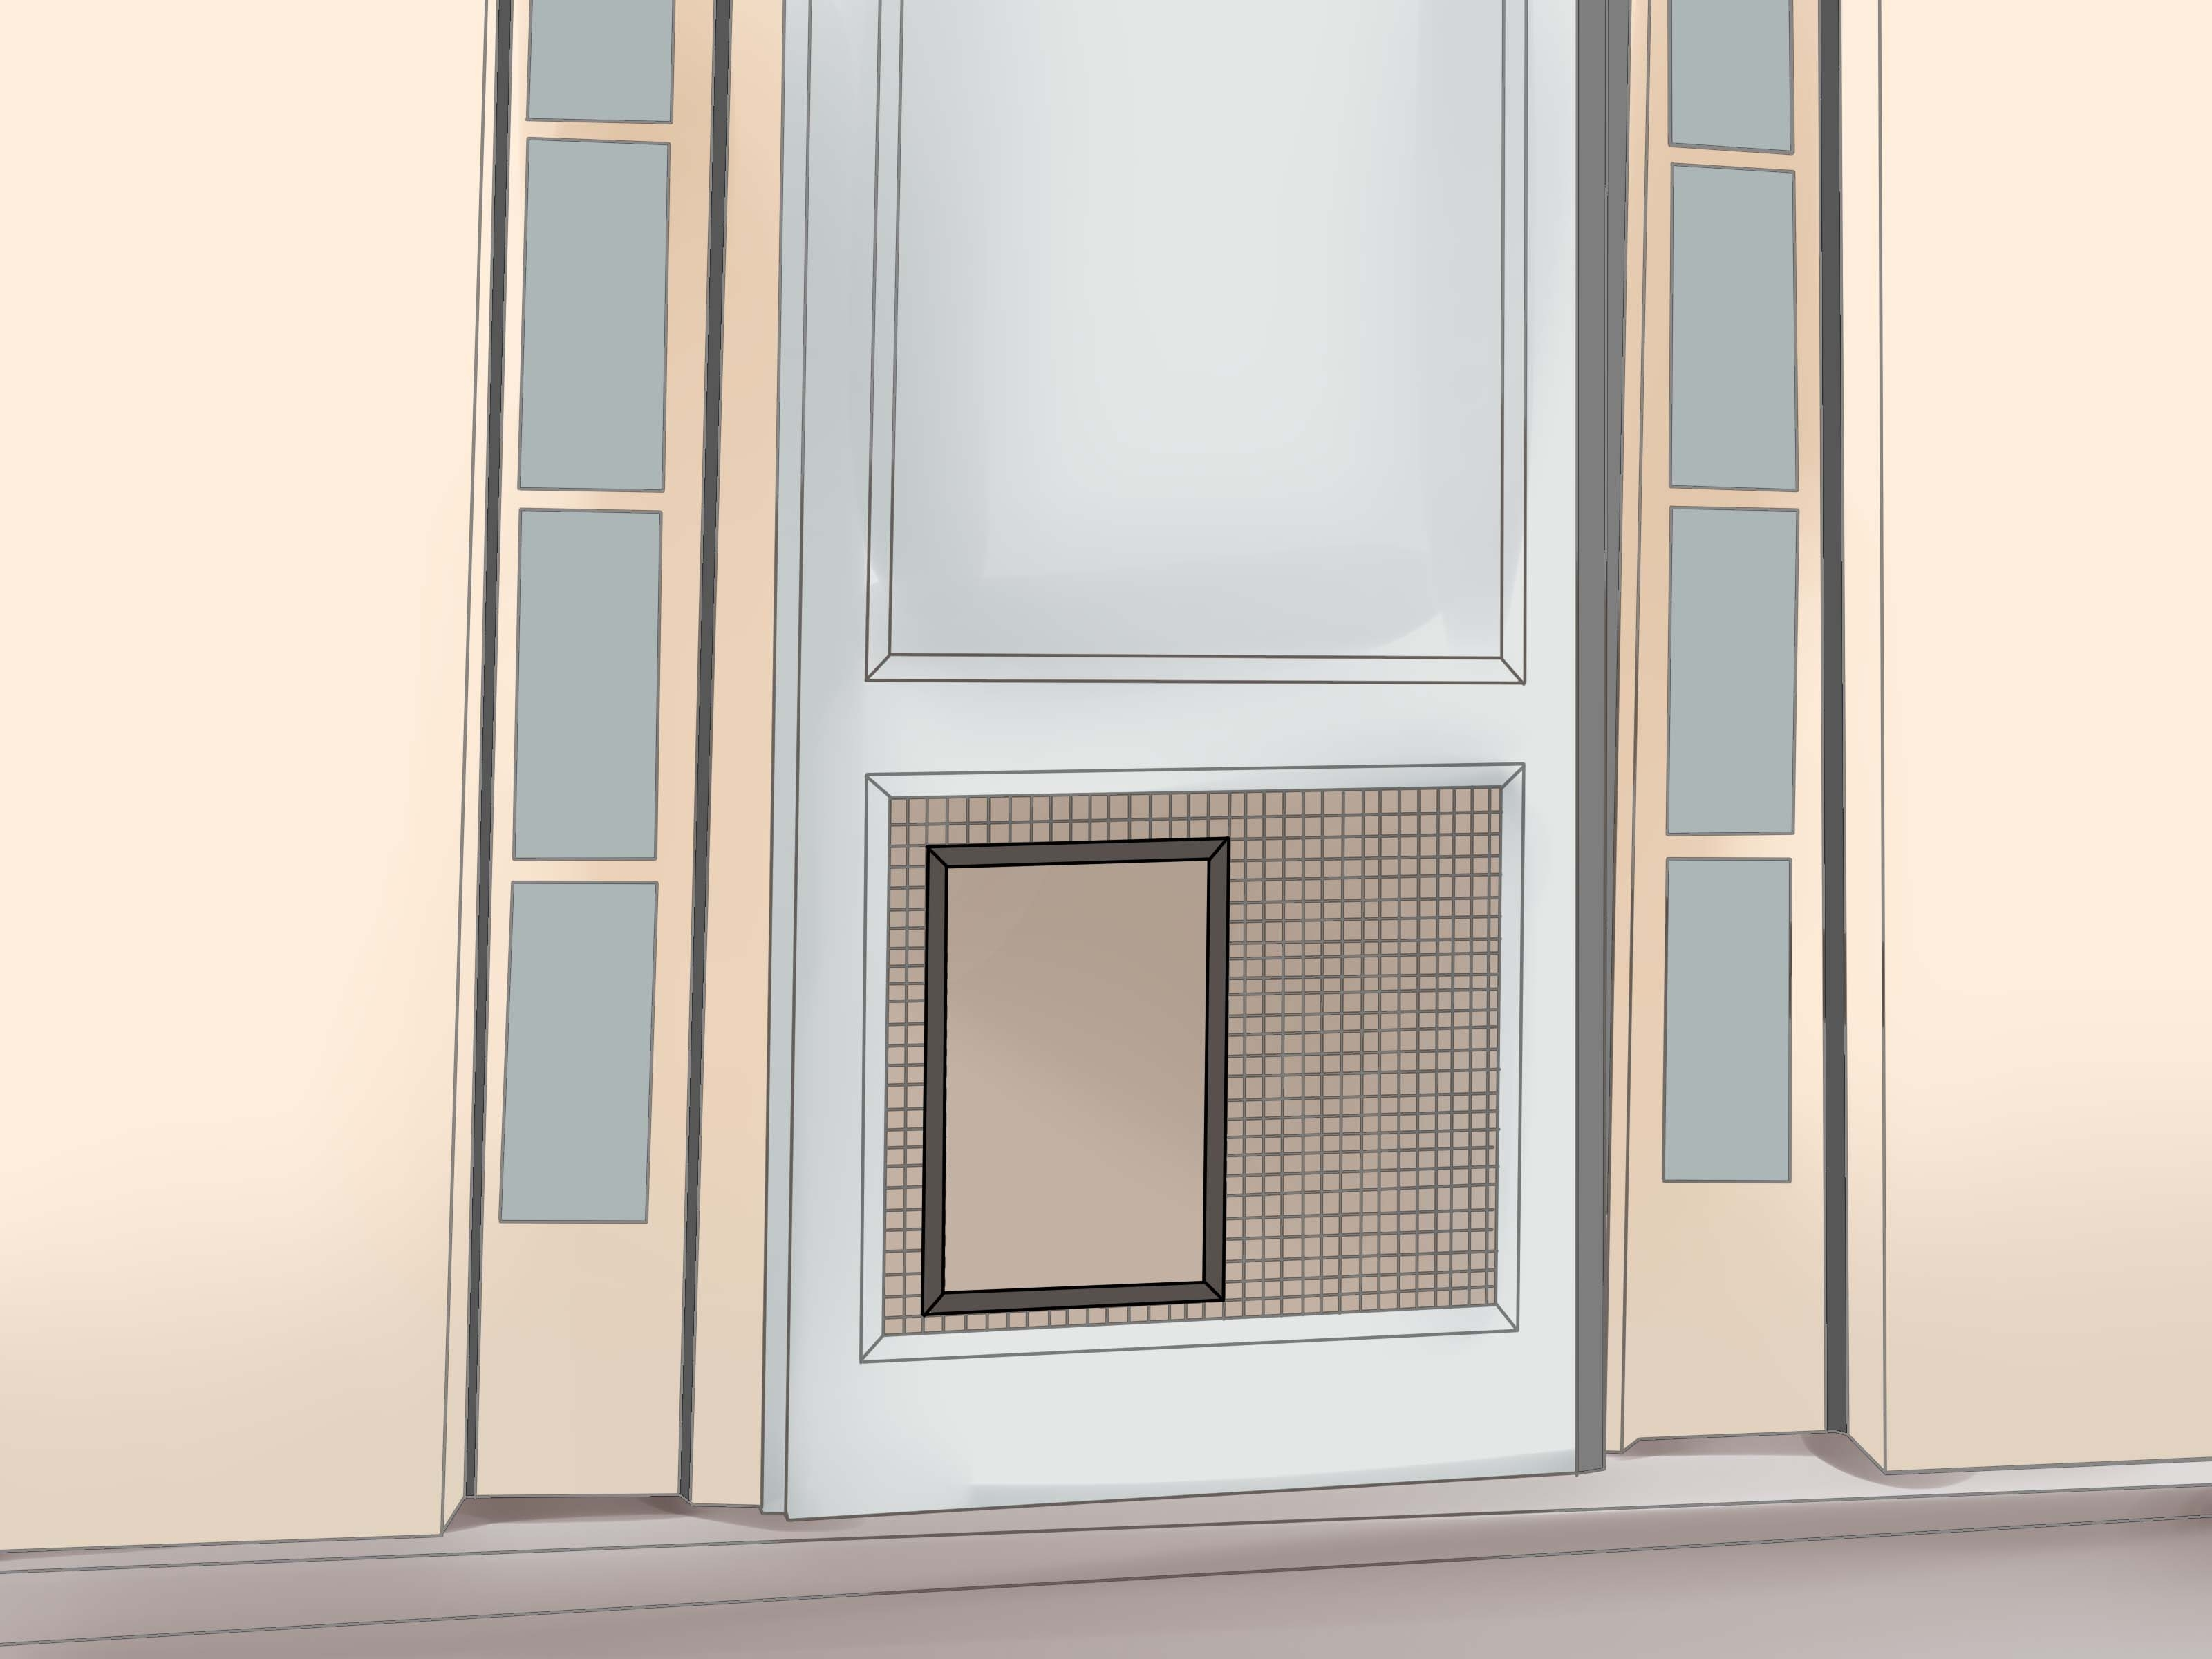 Cat Doors For Side Sliding Windowscat Door For Side Sliding Window  Saudireiki